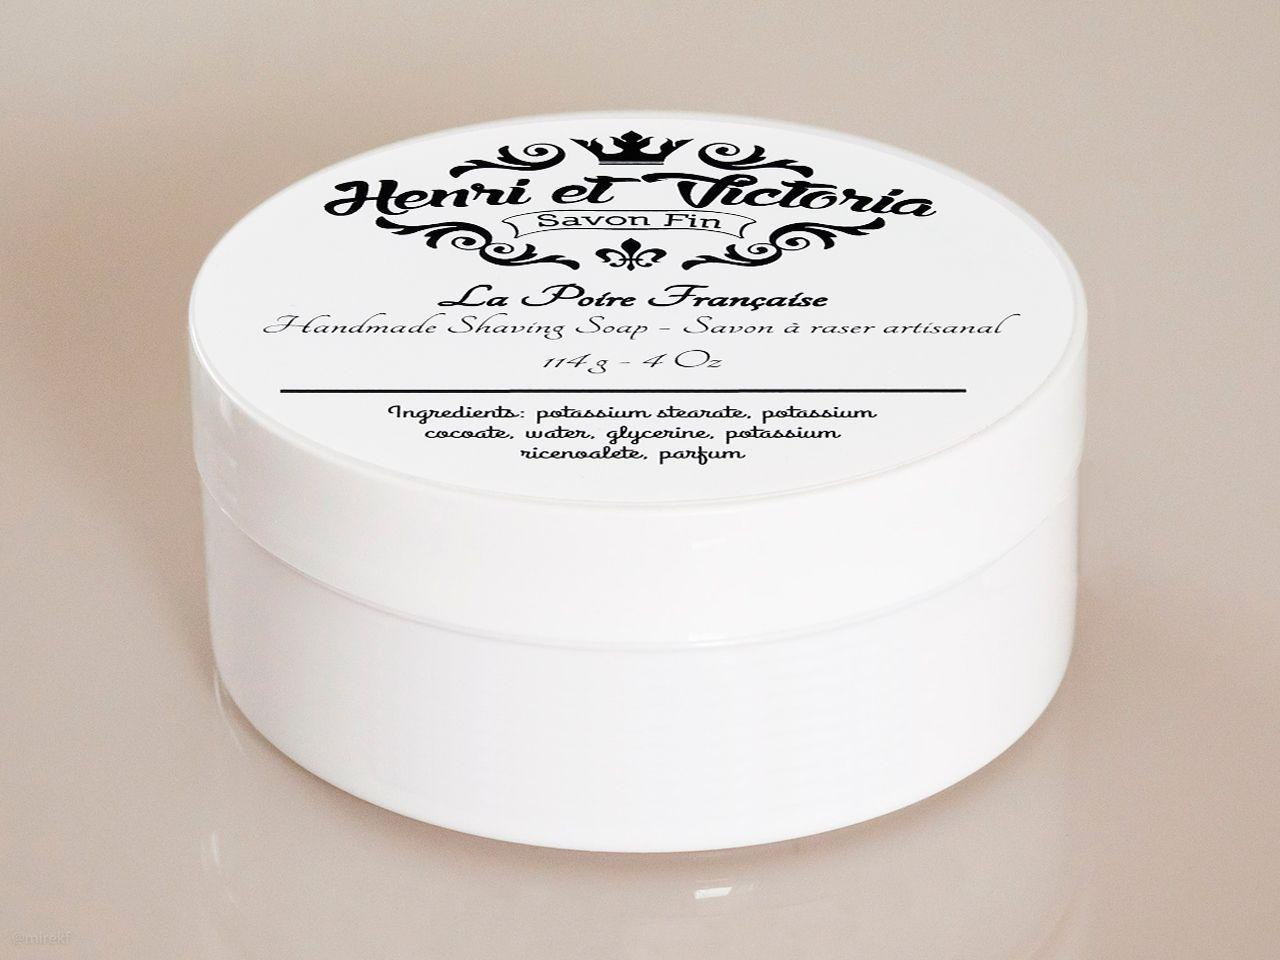 Opakowanie mydła do golenia Henri et Victoria La Poire Française Shaving Soap